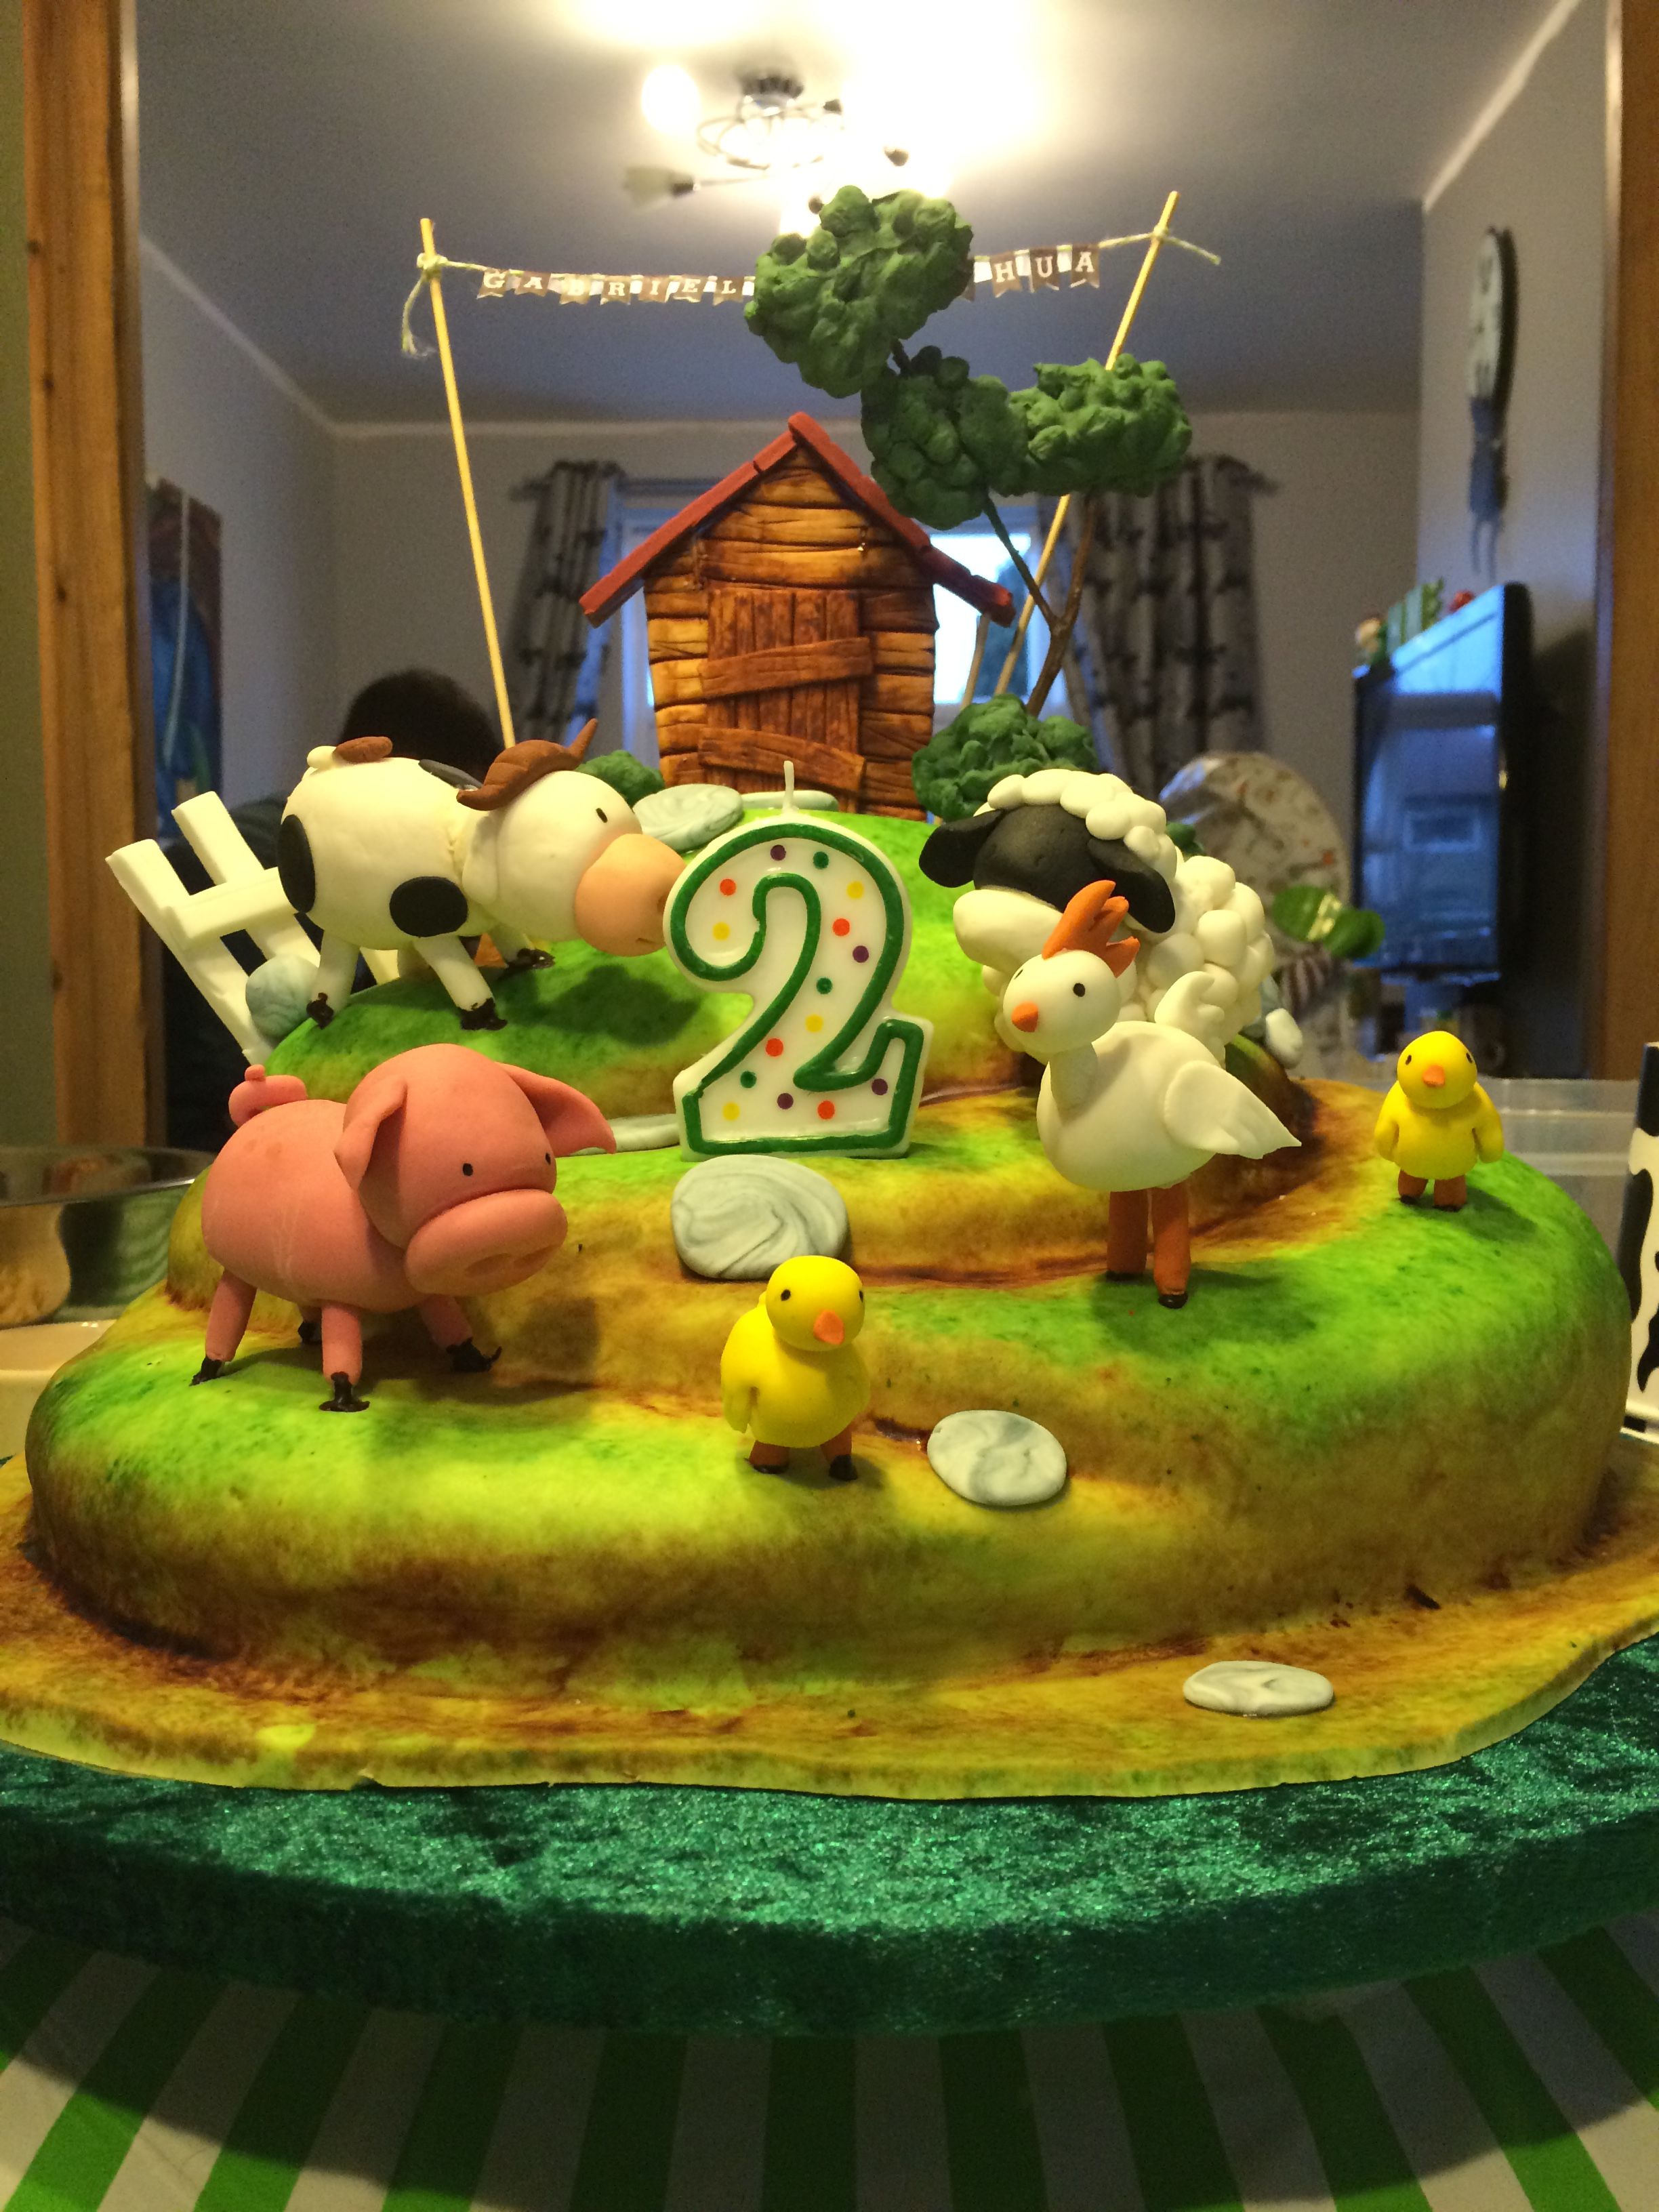 Farm Cake Tutorial By Yeners Way Cake Art Tutorials